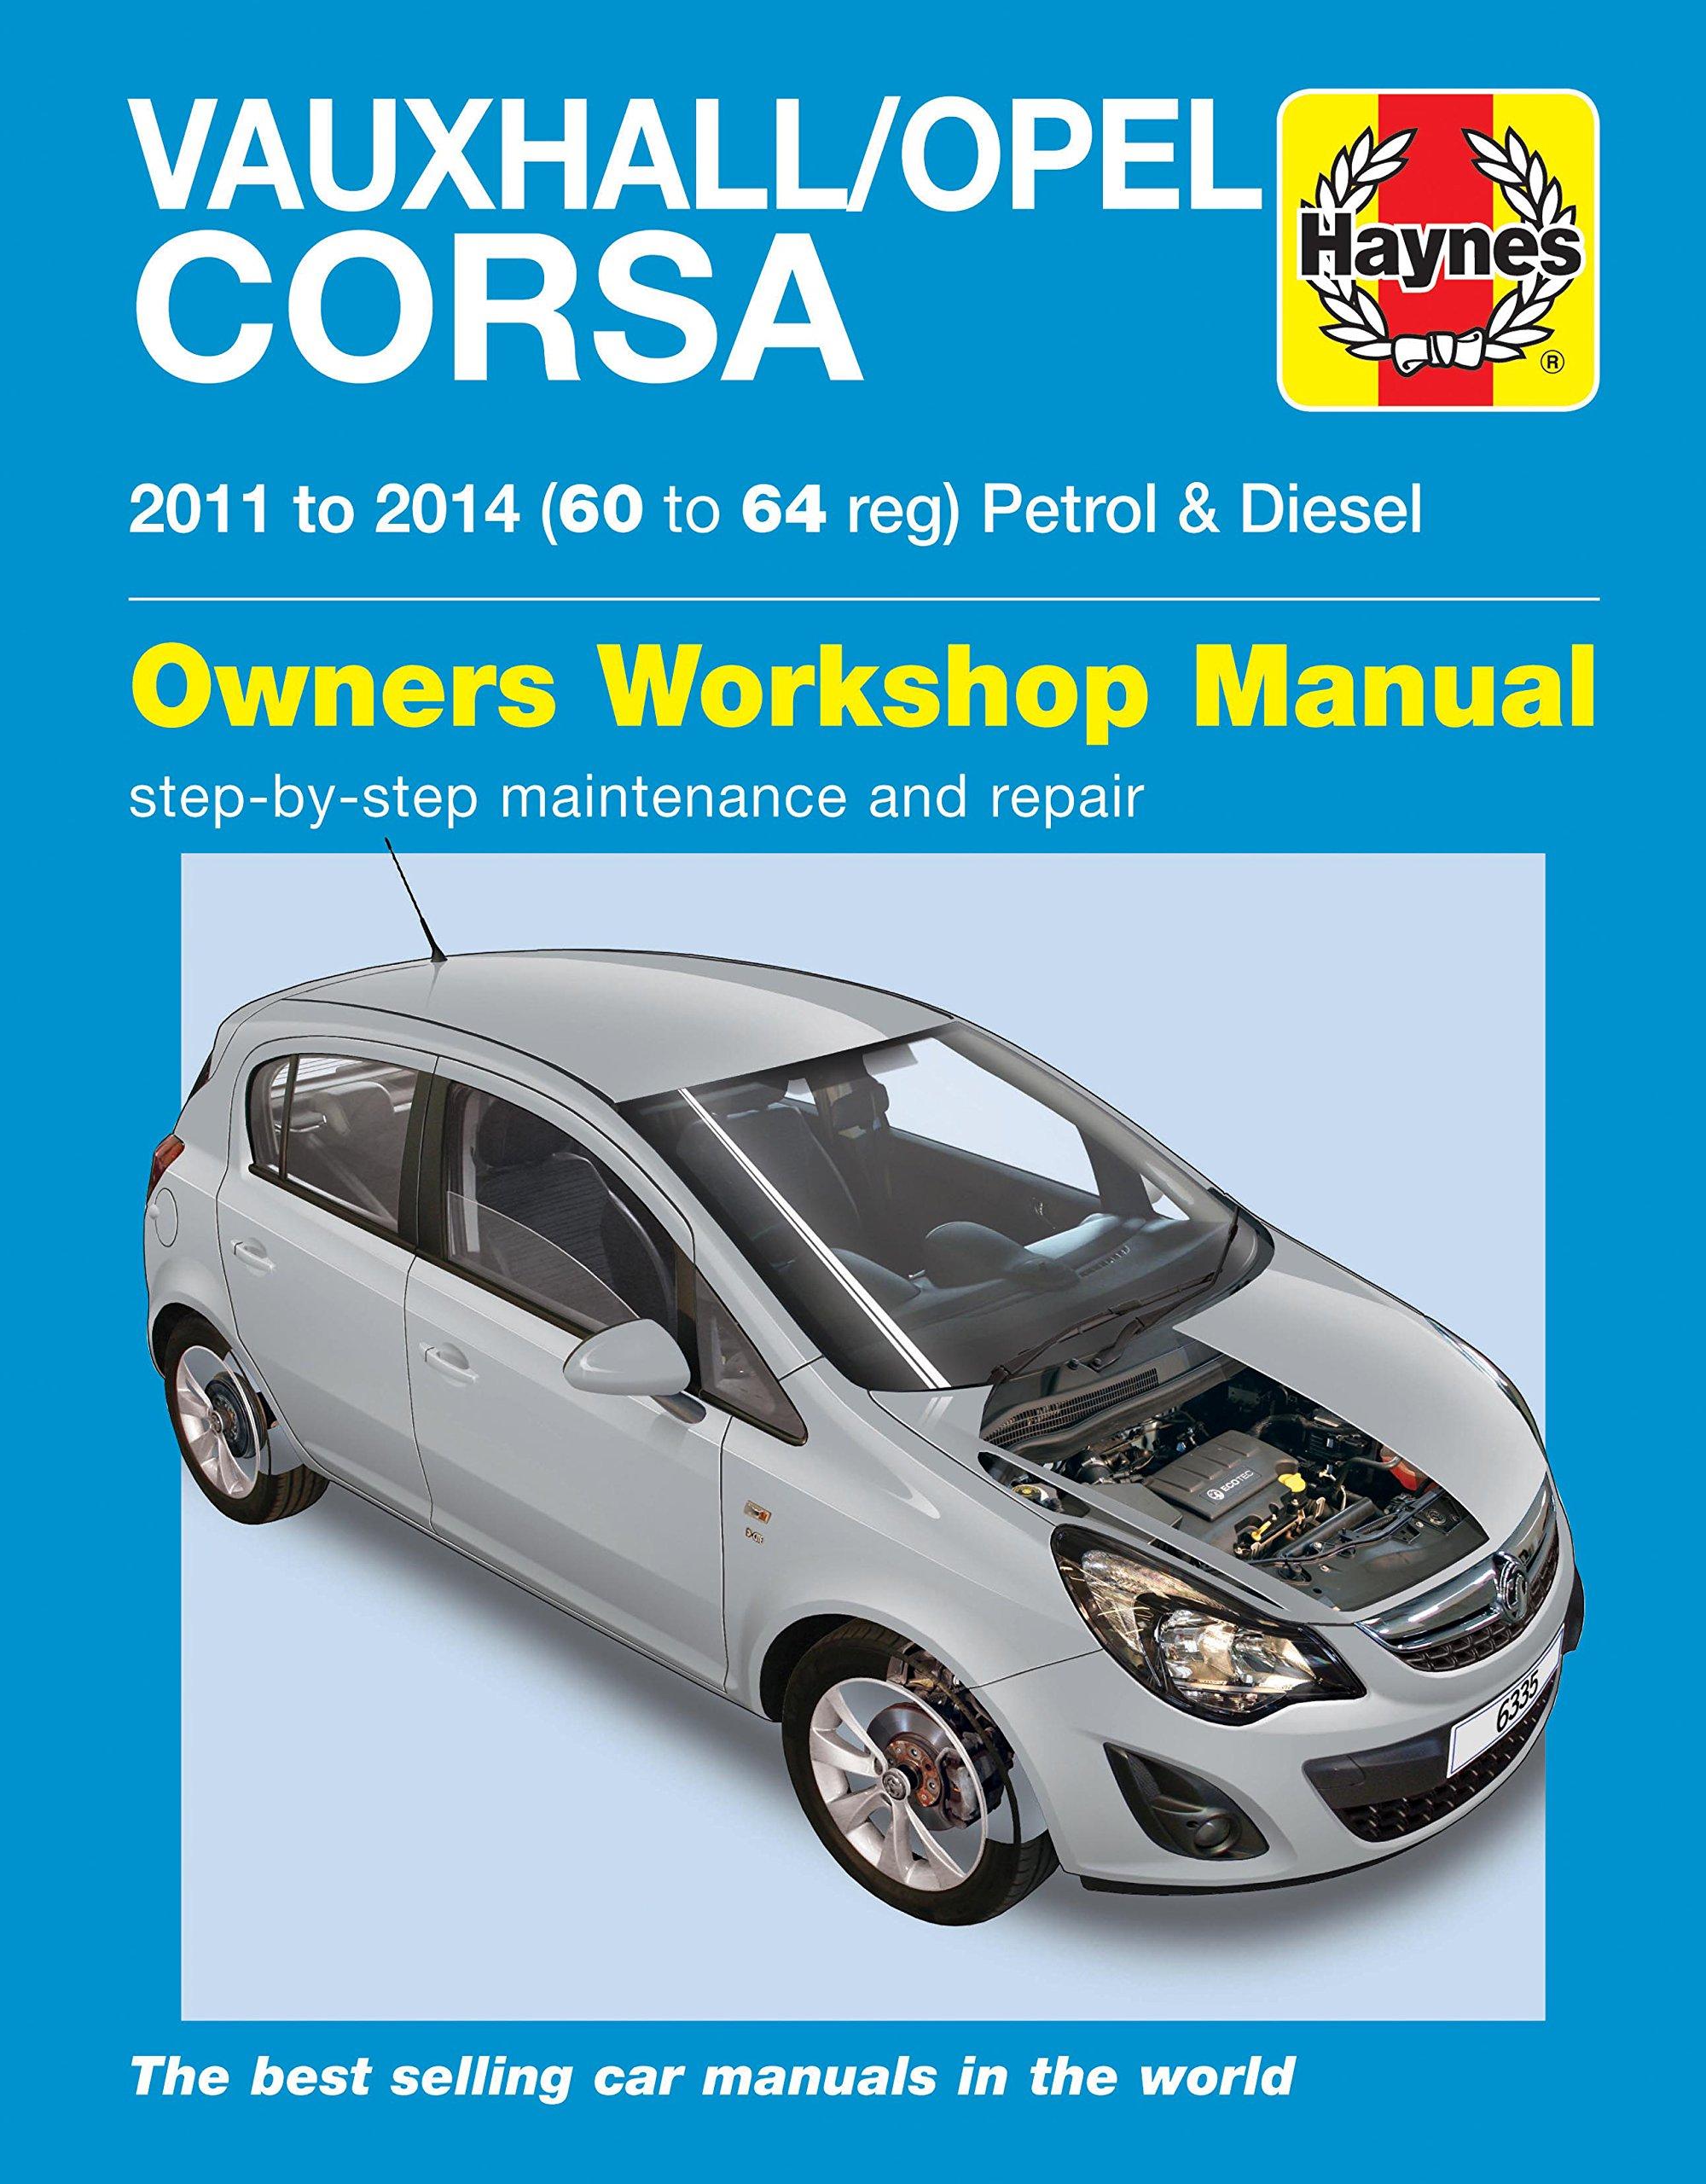 Vauxhall/Opel Corsa Petrol & Diesel 11-14 60 To 64: Amazon.es: John S. Mead: Libros en idiomas extranjeros